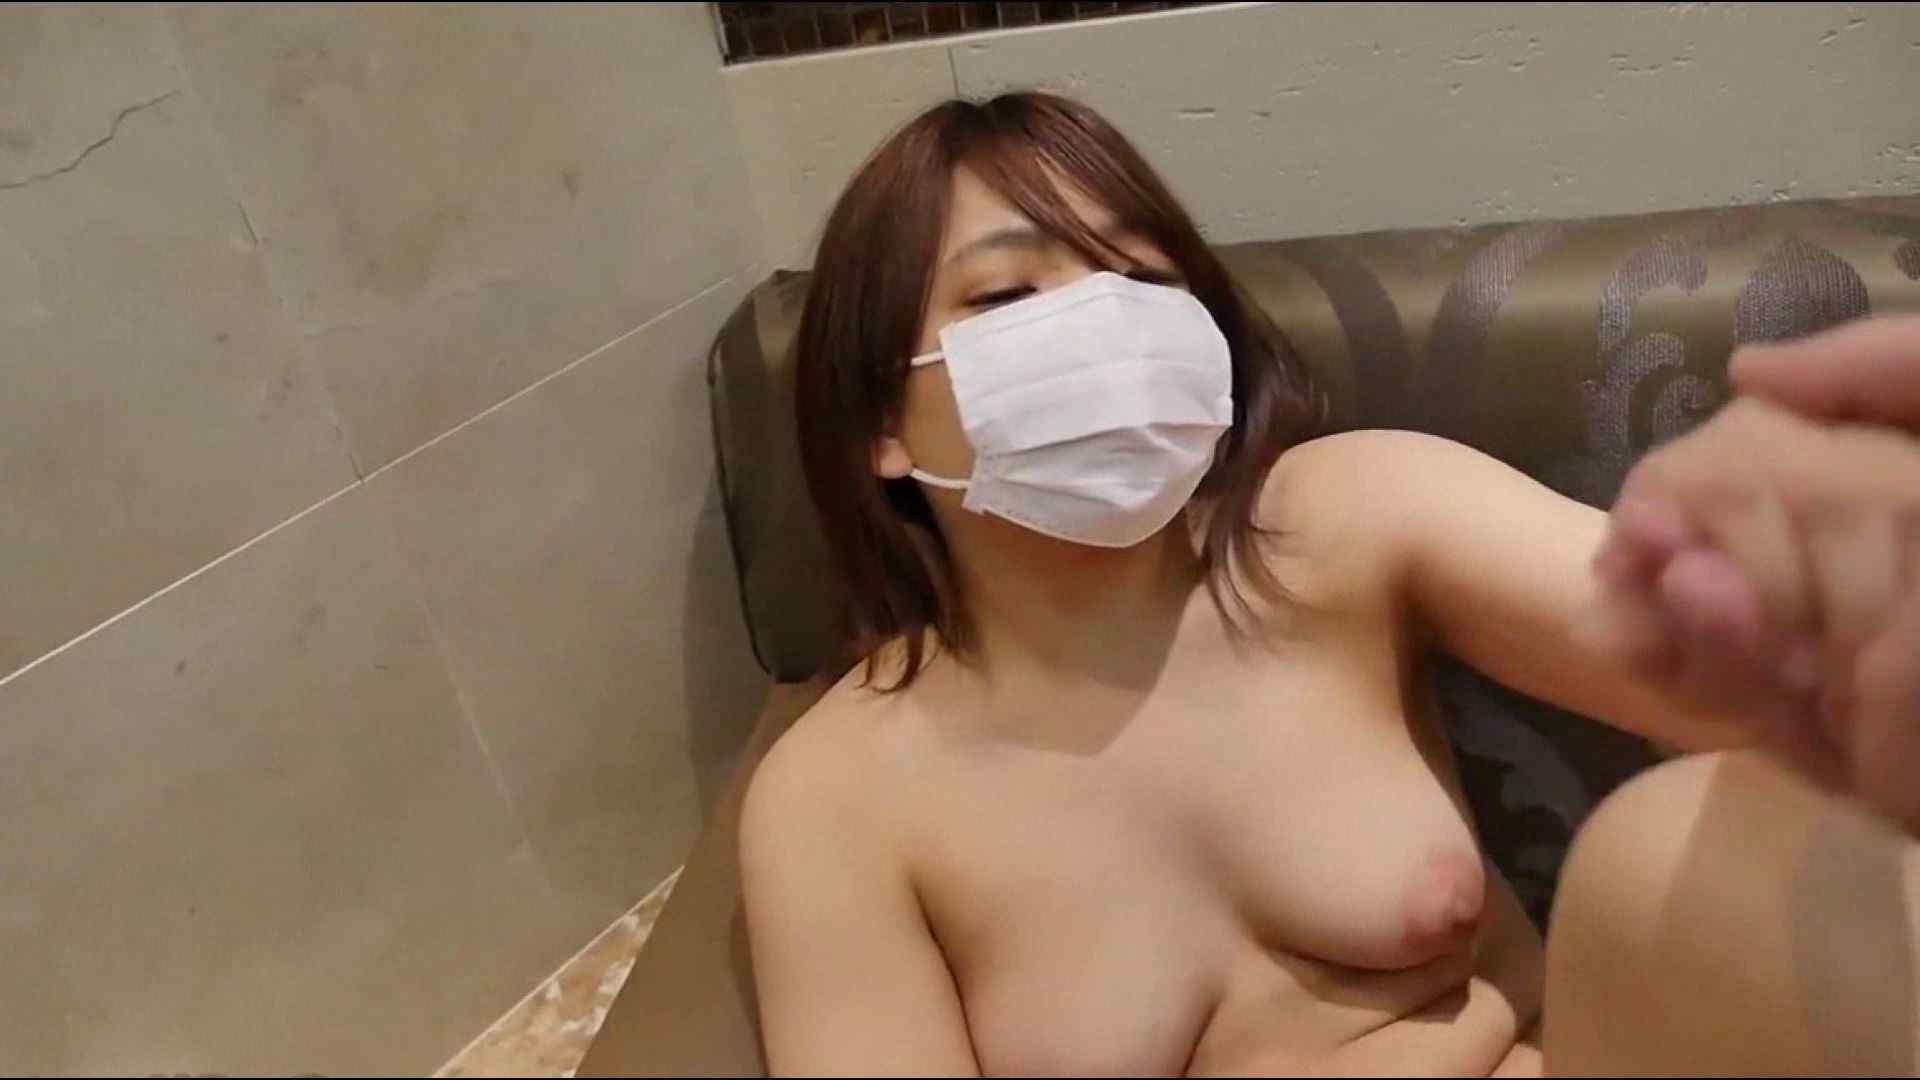 S級厳選美女ビッチガールVol.41 前編 OL女体  105連発 24